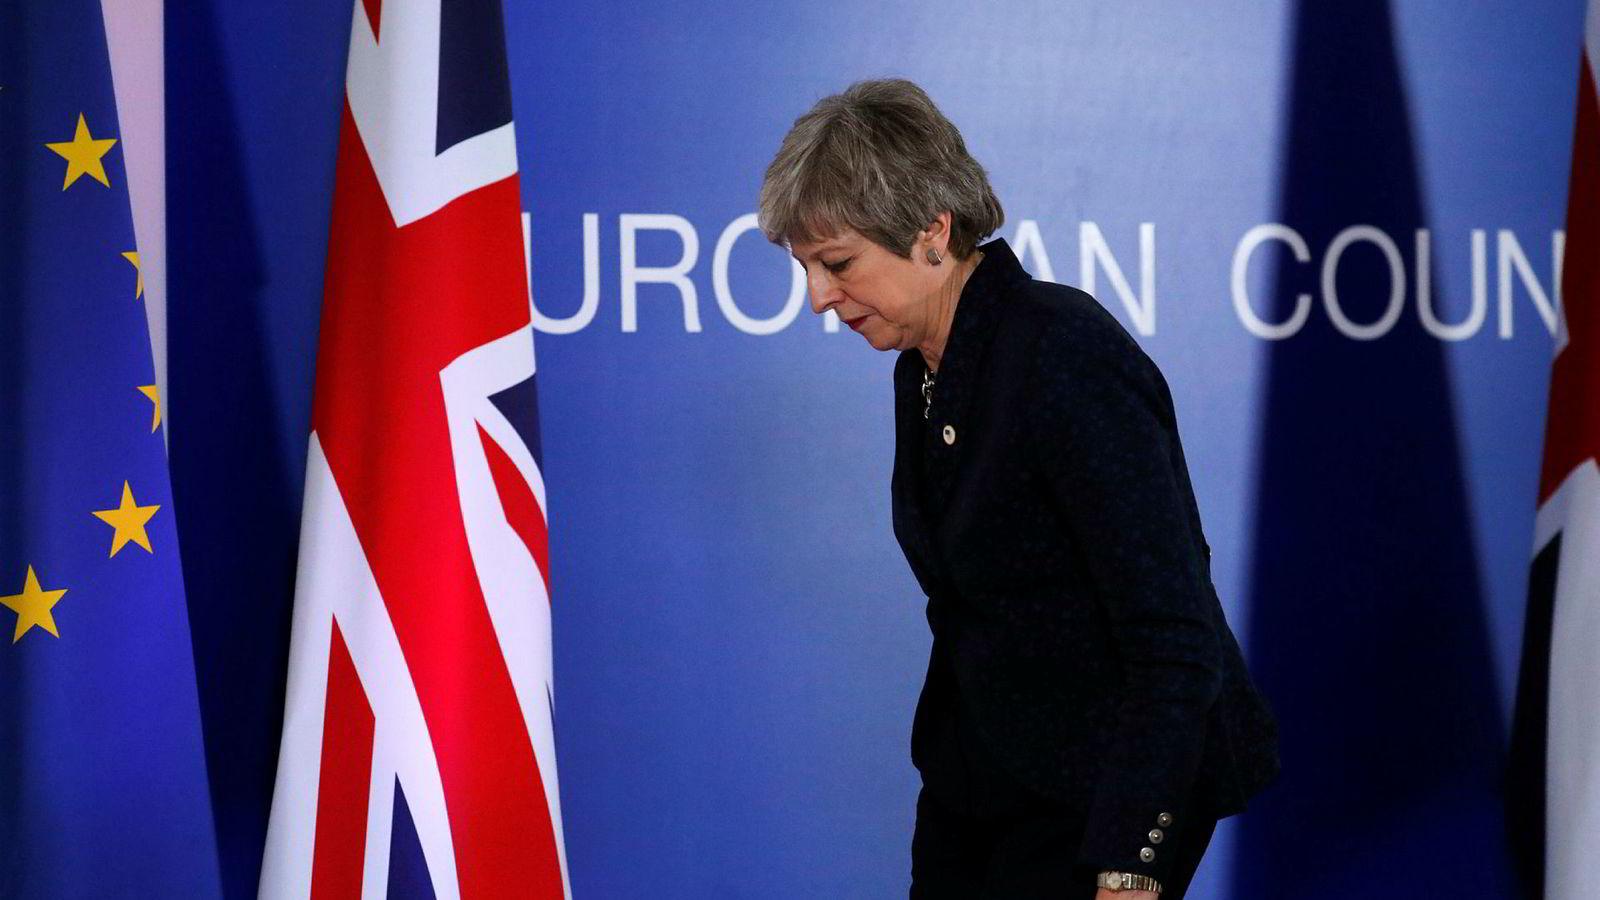 Statsminister Theresa May etter pressekonferansen i Brussel torsdag kveld.